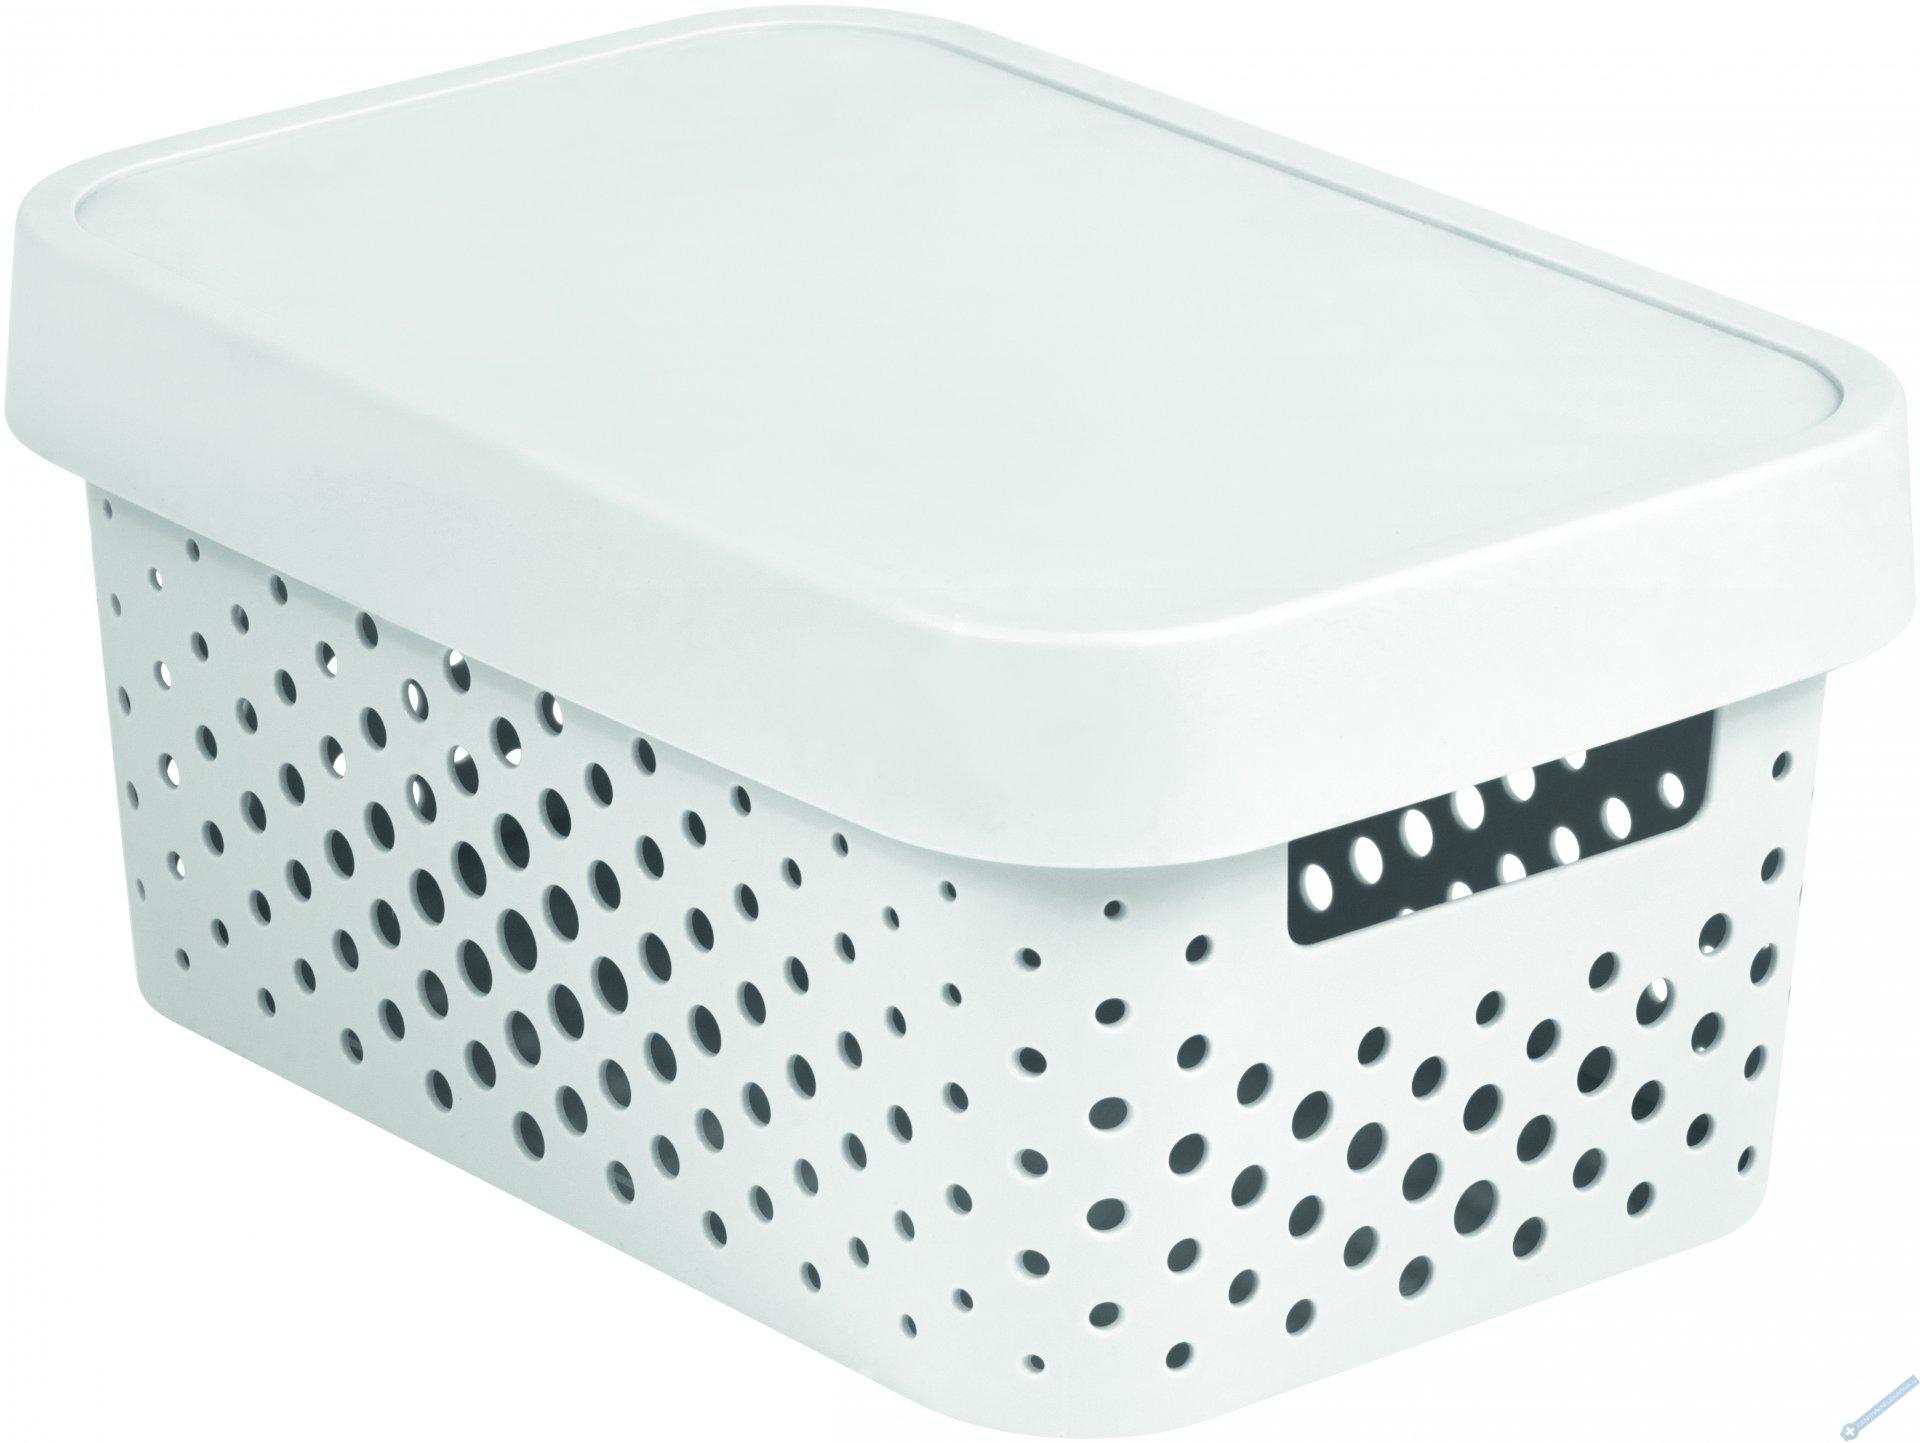 Úložný box INFINITY 4,5l s víkem bílý puntíky